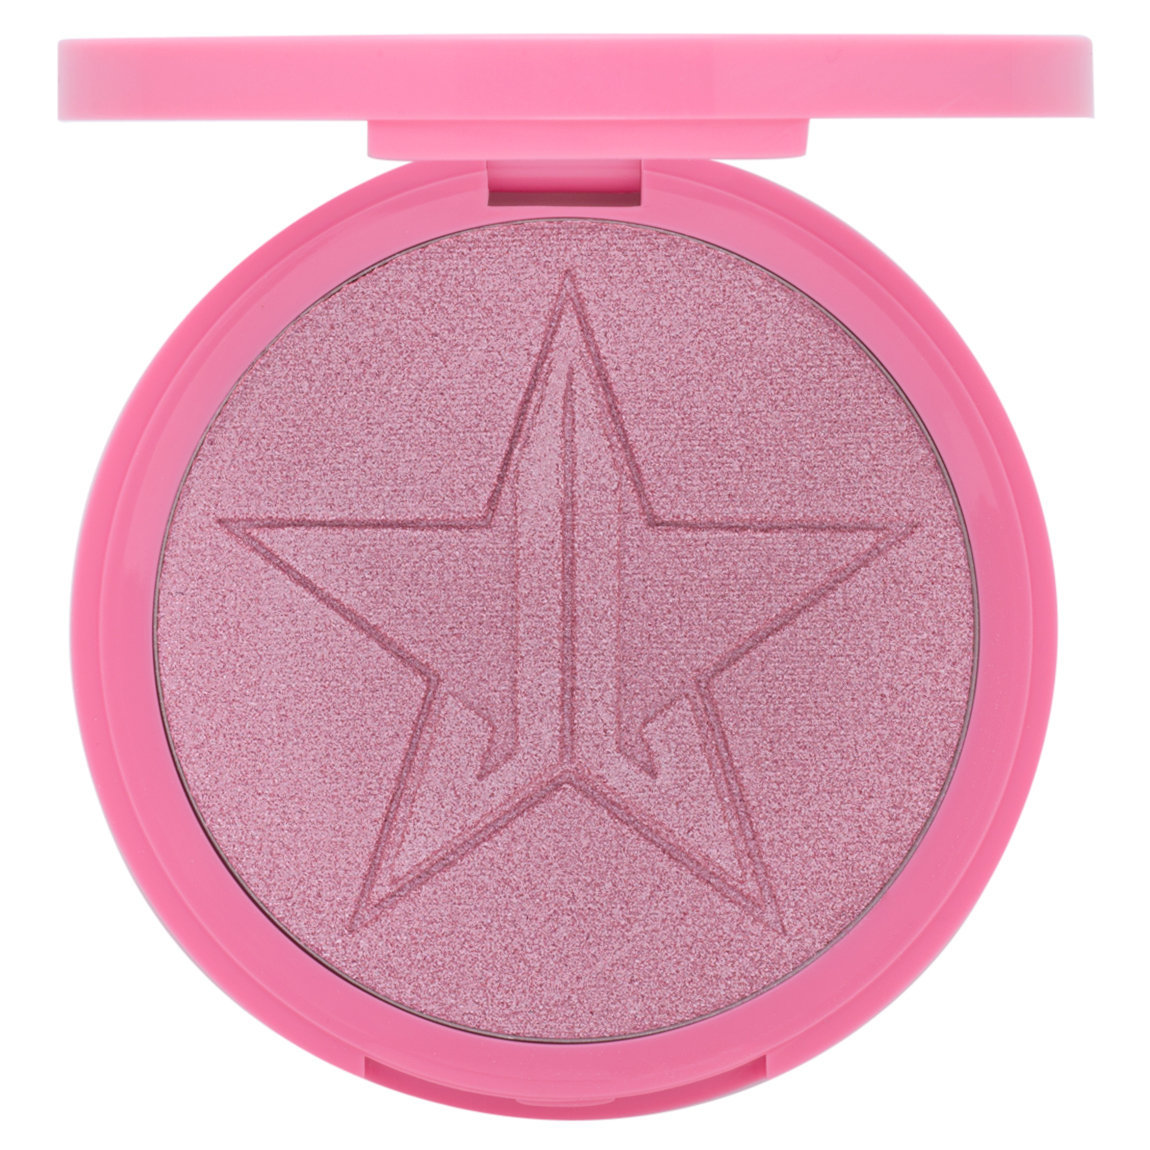 Jeffree Star Cosmetics Skin Frost Neffree product swatch.